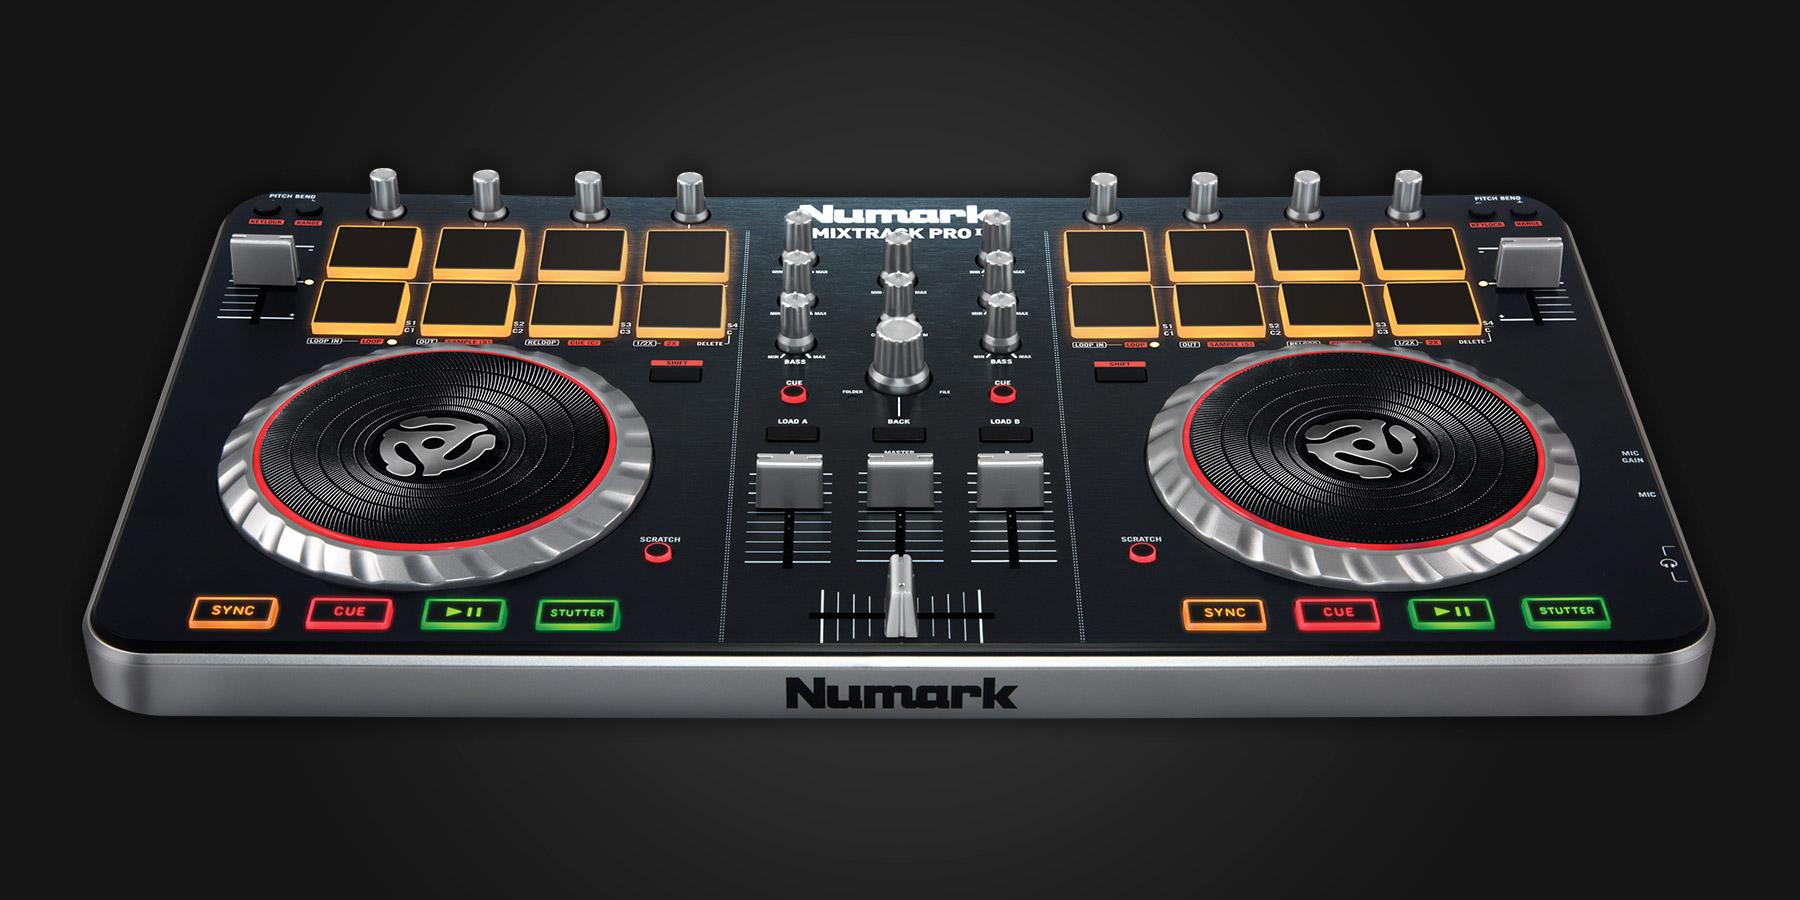 Numark Mixtrack Pro II - Serato DJ Hardware